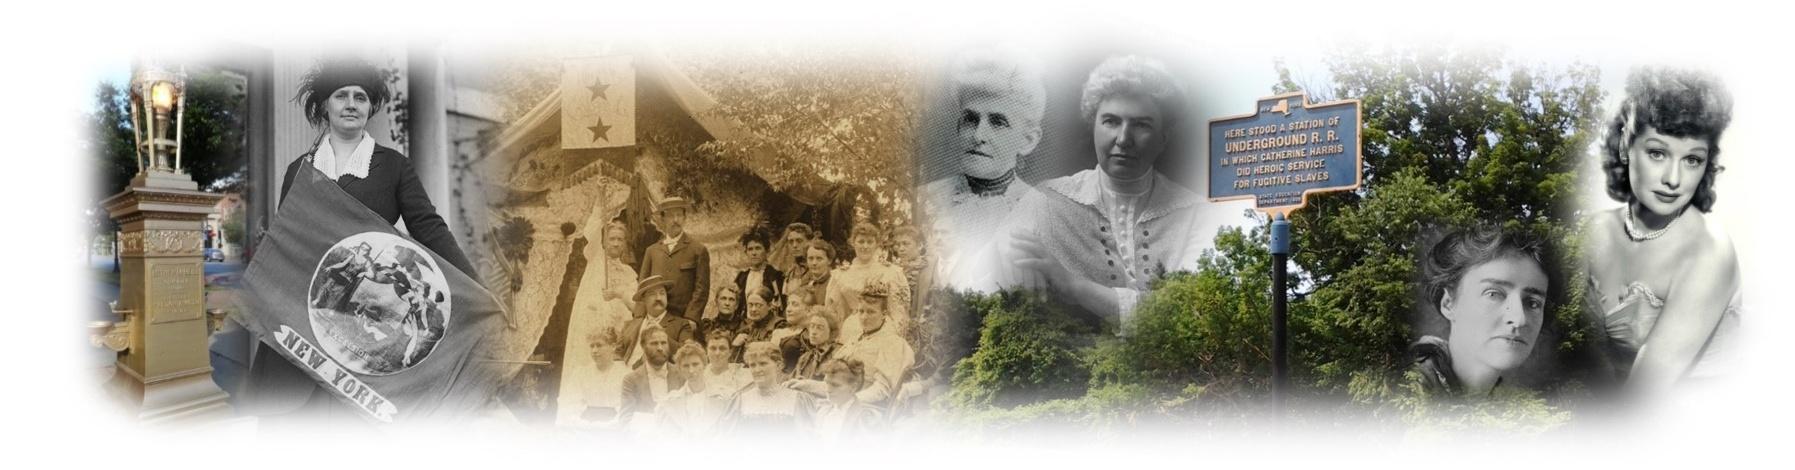 Making Women's History